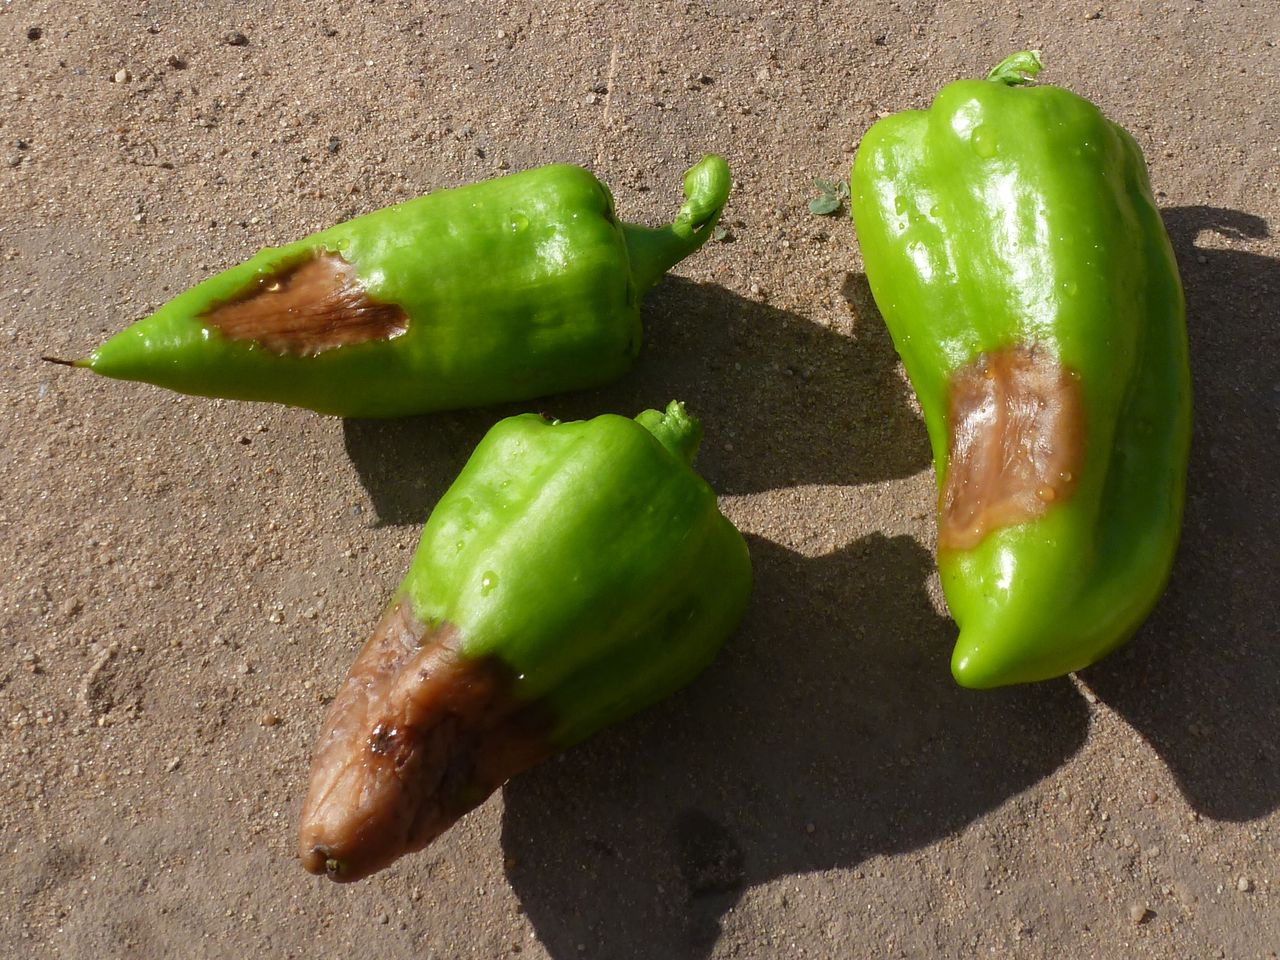 подкормка овощей во время плодоношения